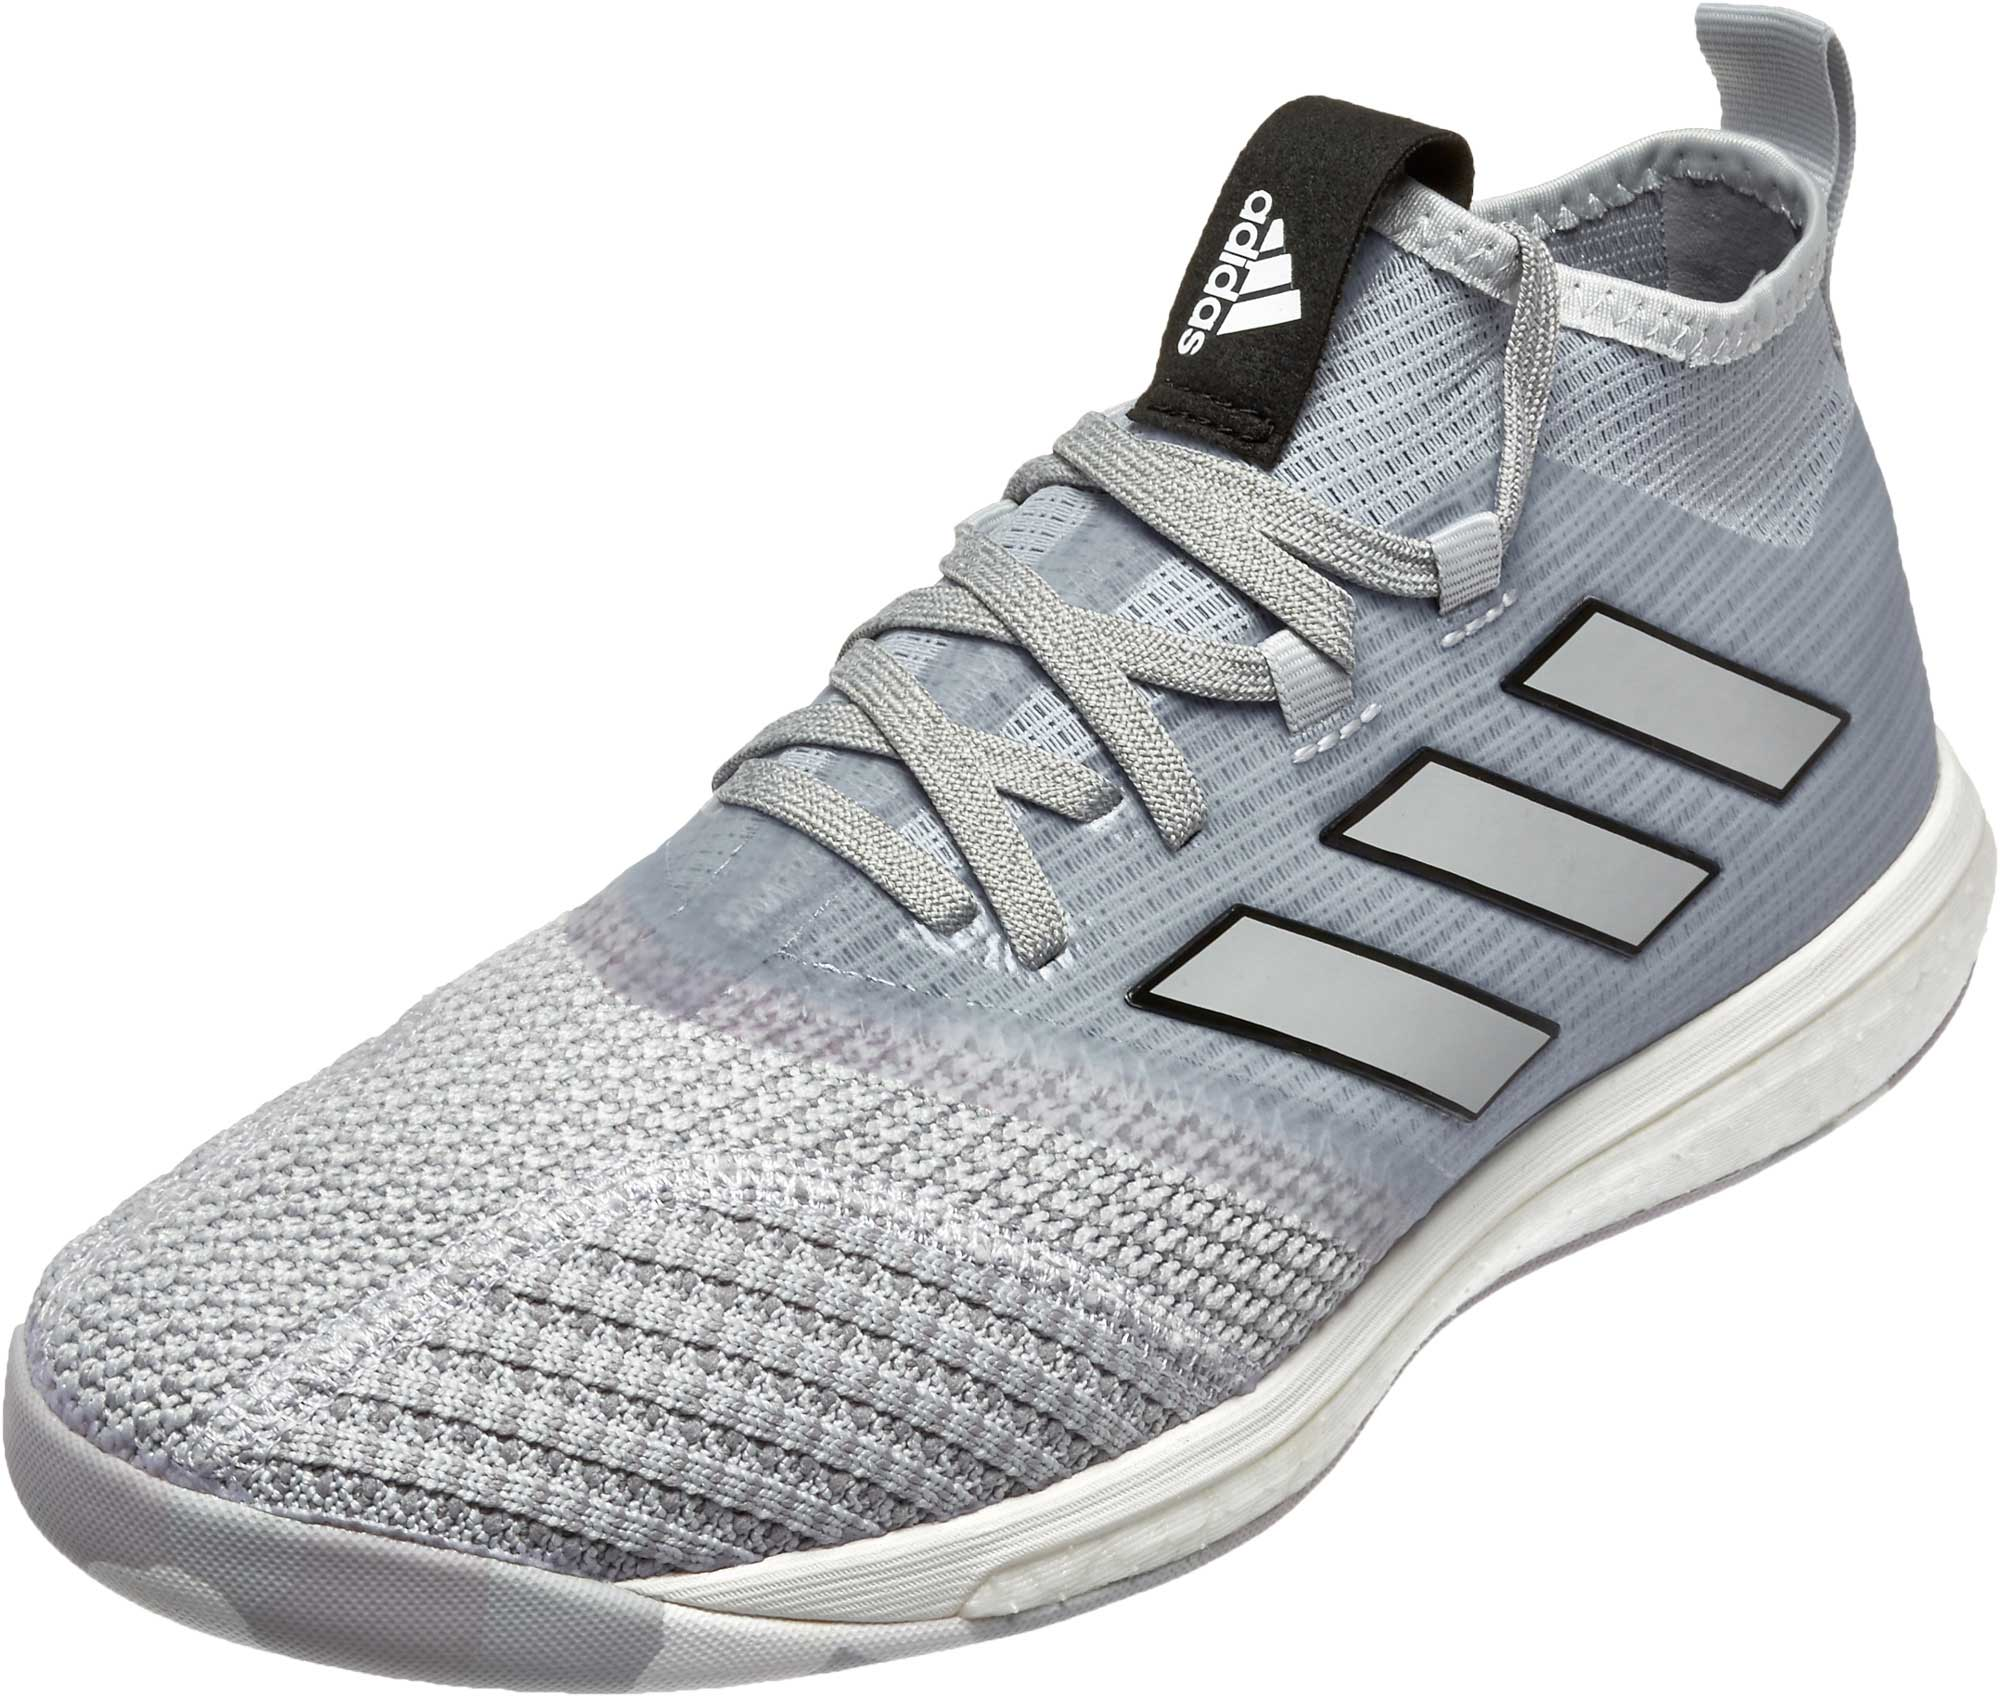 33ca94b0a370 Grey adidas ACE Tango 17.1 Trainer - SoccerPro.com